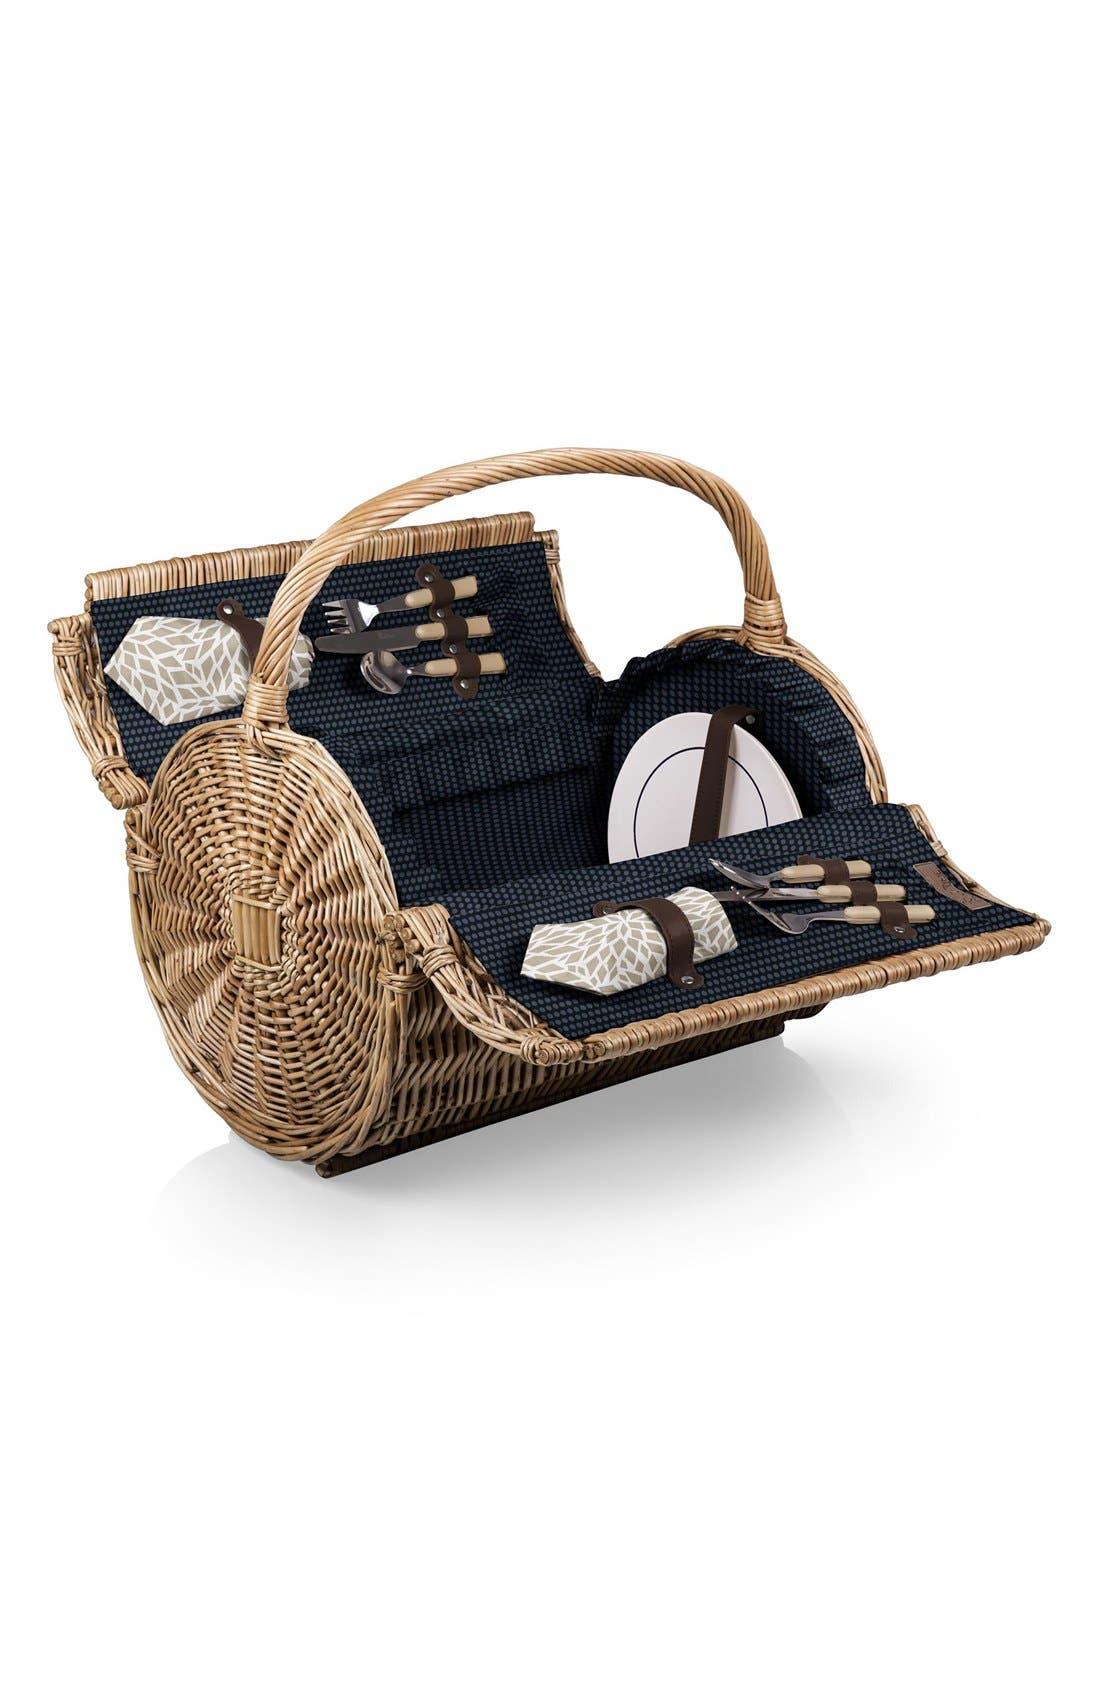 Main Image - Picnic Time Wicker Barrel Picnic Basket